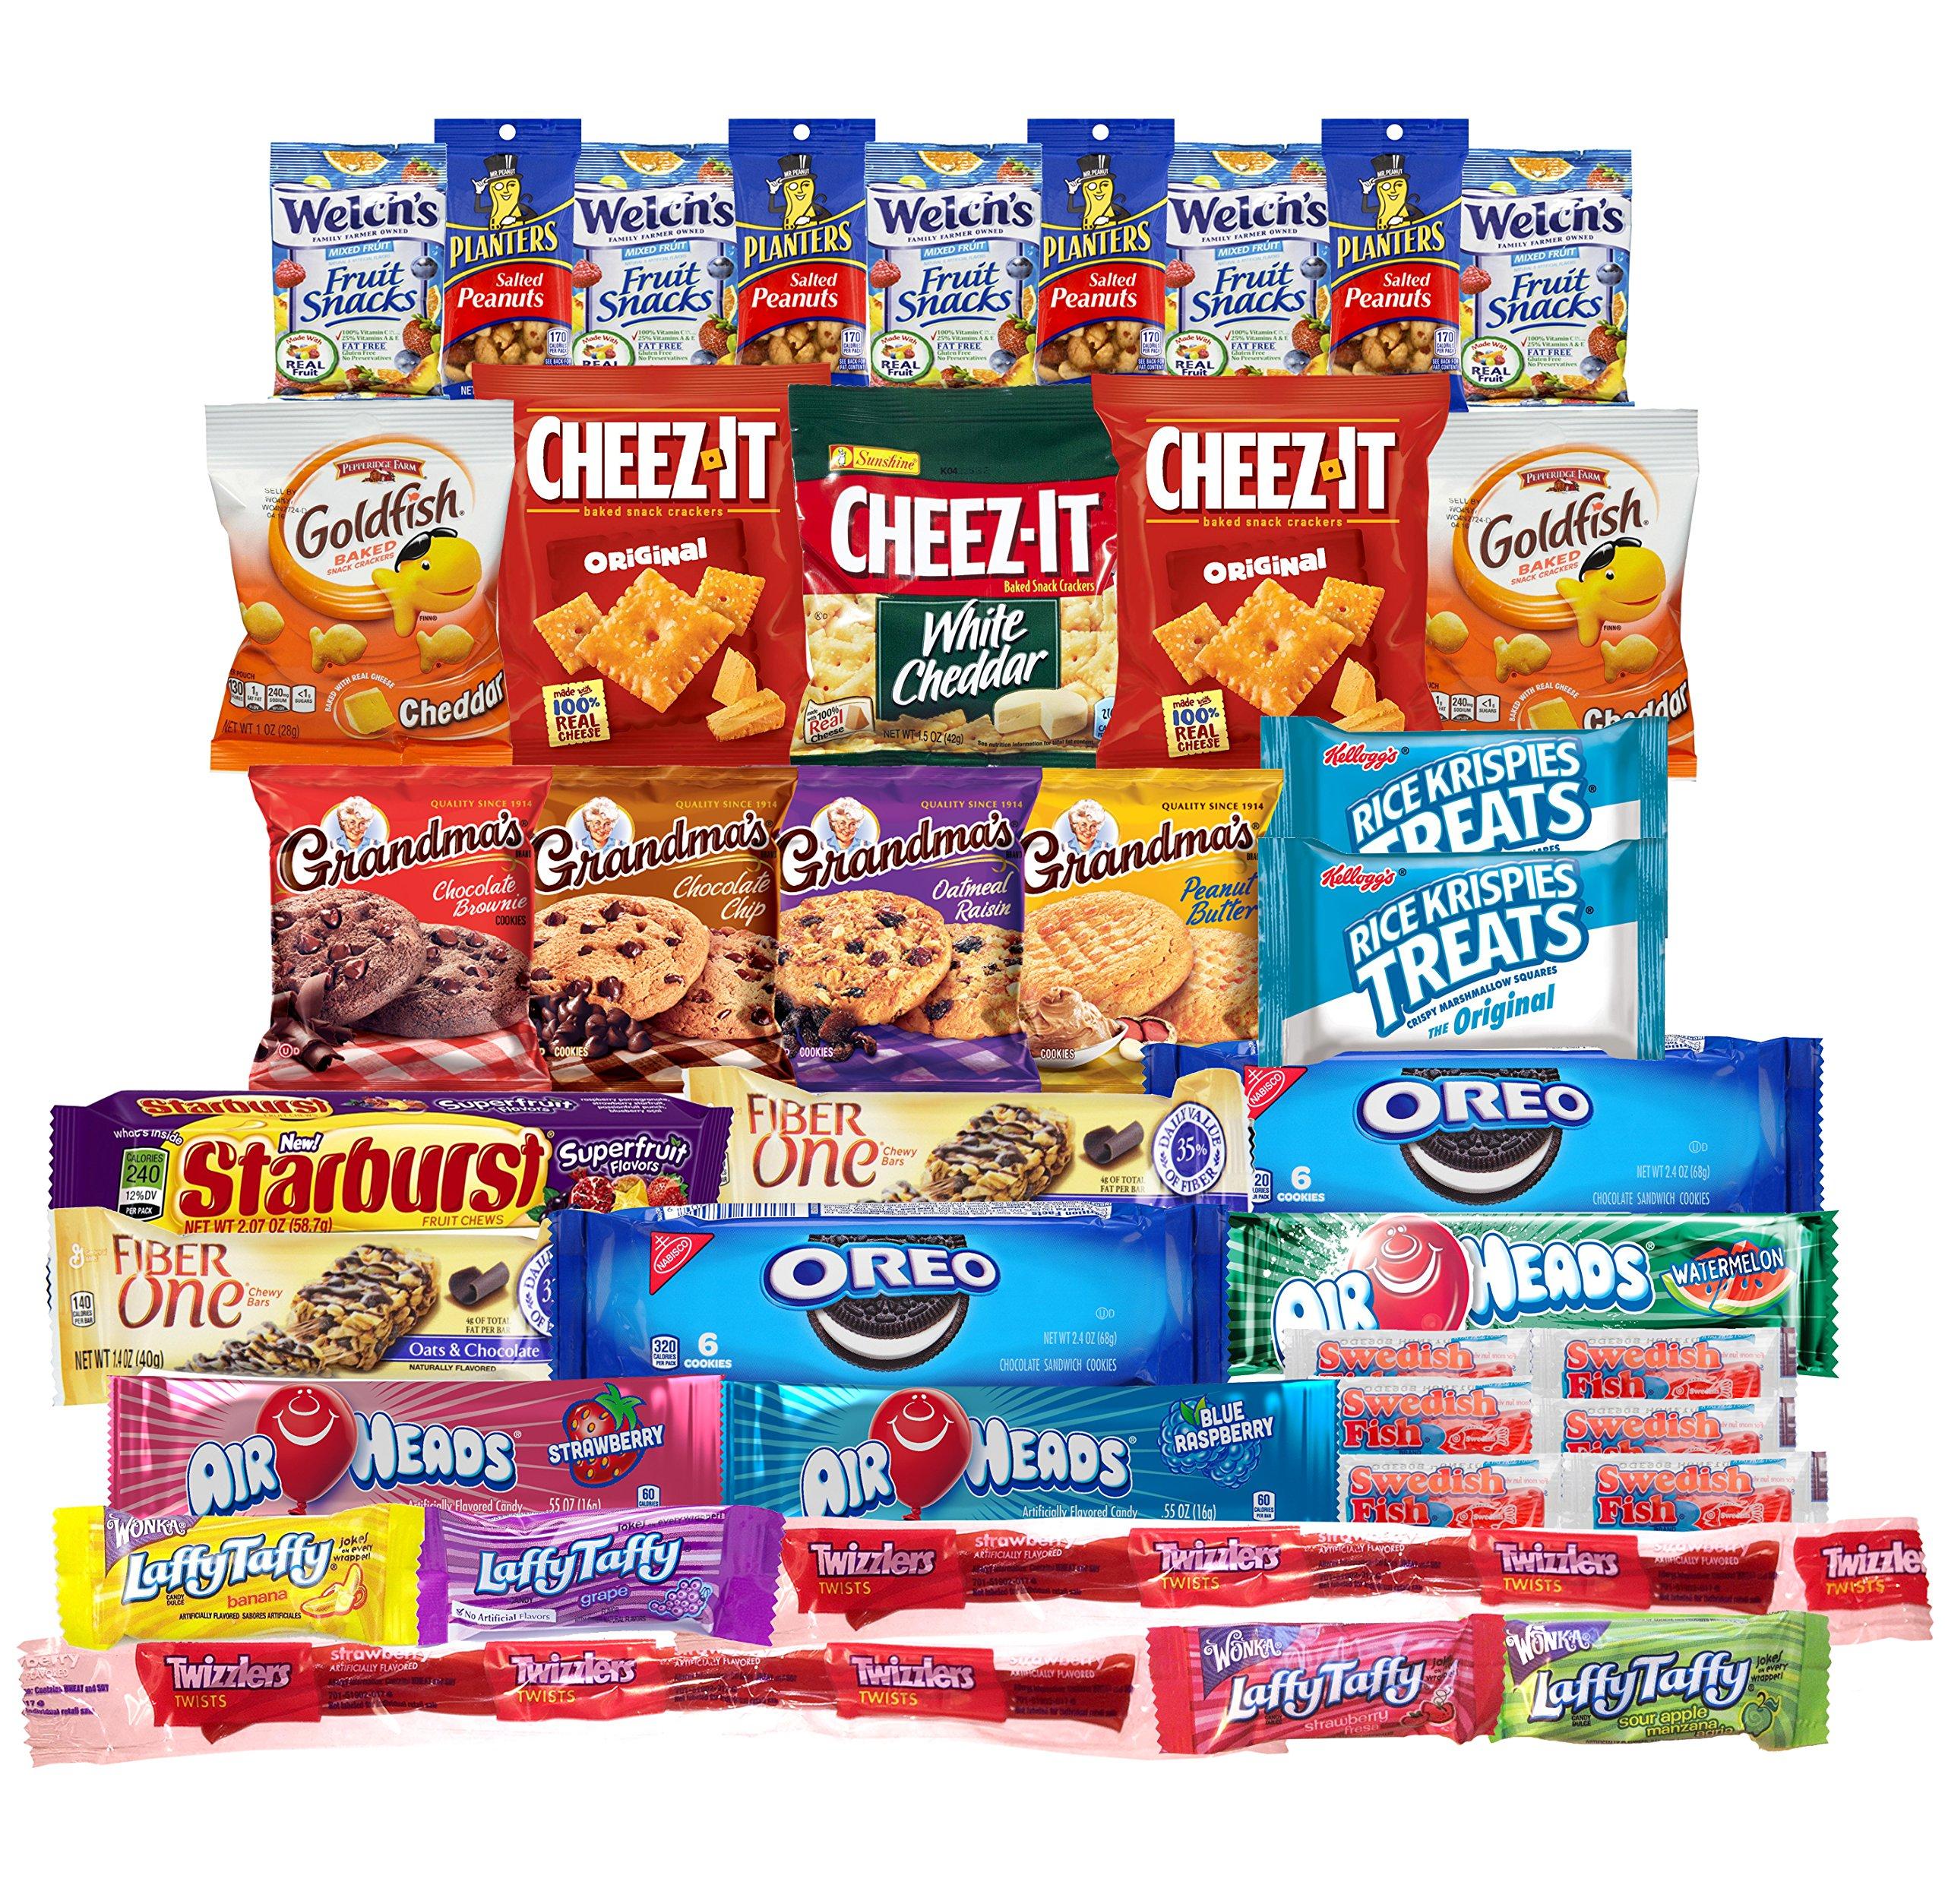 Amazon.com: Healthy Snacks, Drinks, Juice, and Junk Food ...